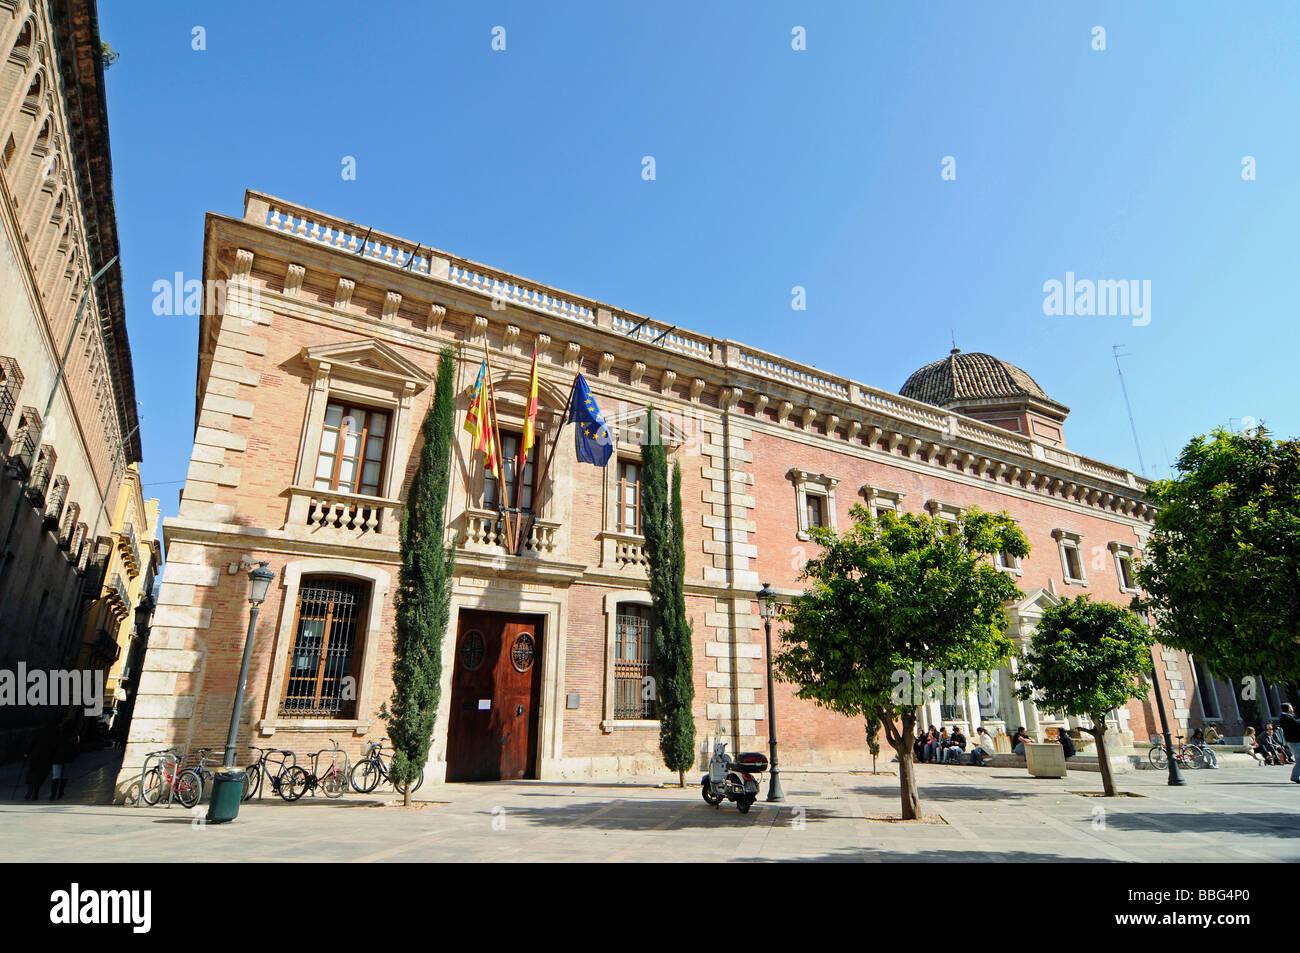 Universidad Literaria, university, exhibitions, art, literature, museum, square, Plaza del Patriarca, Valencia, - Stock Image